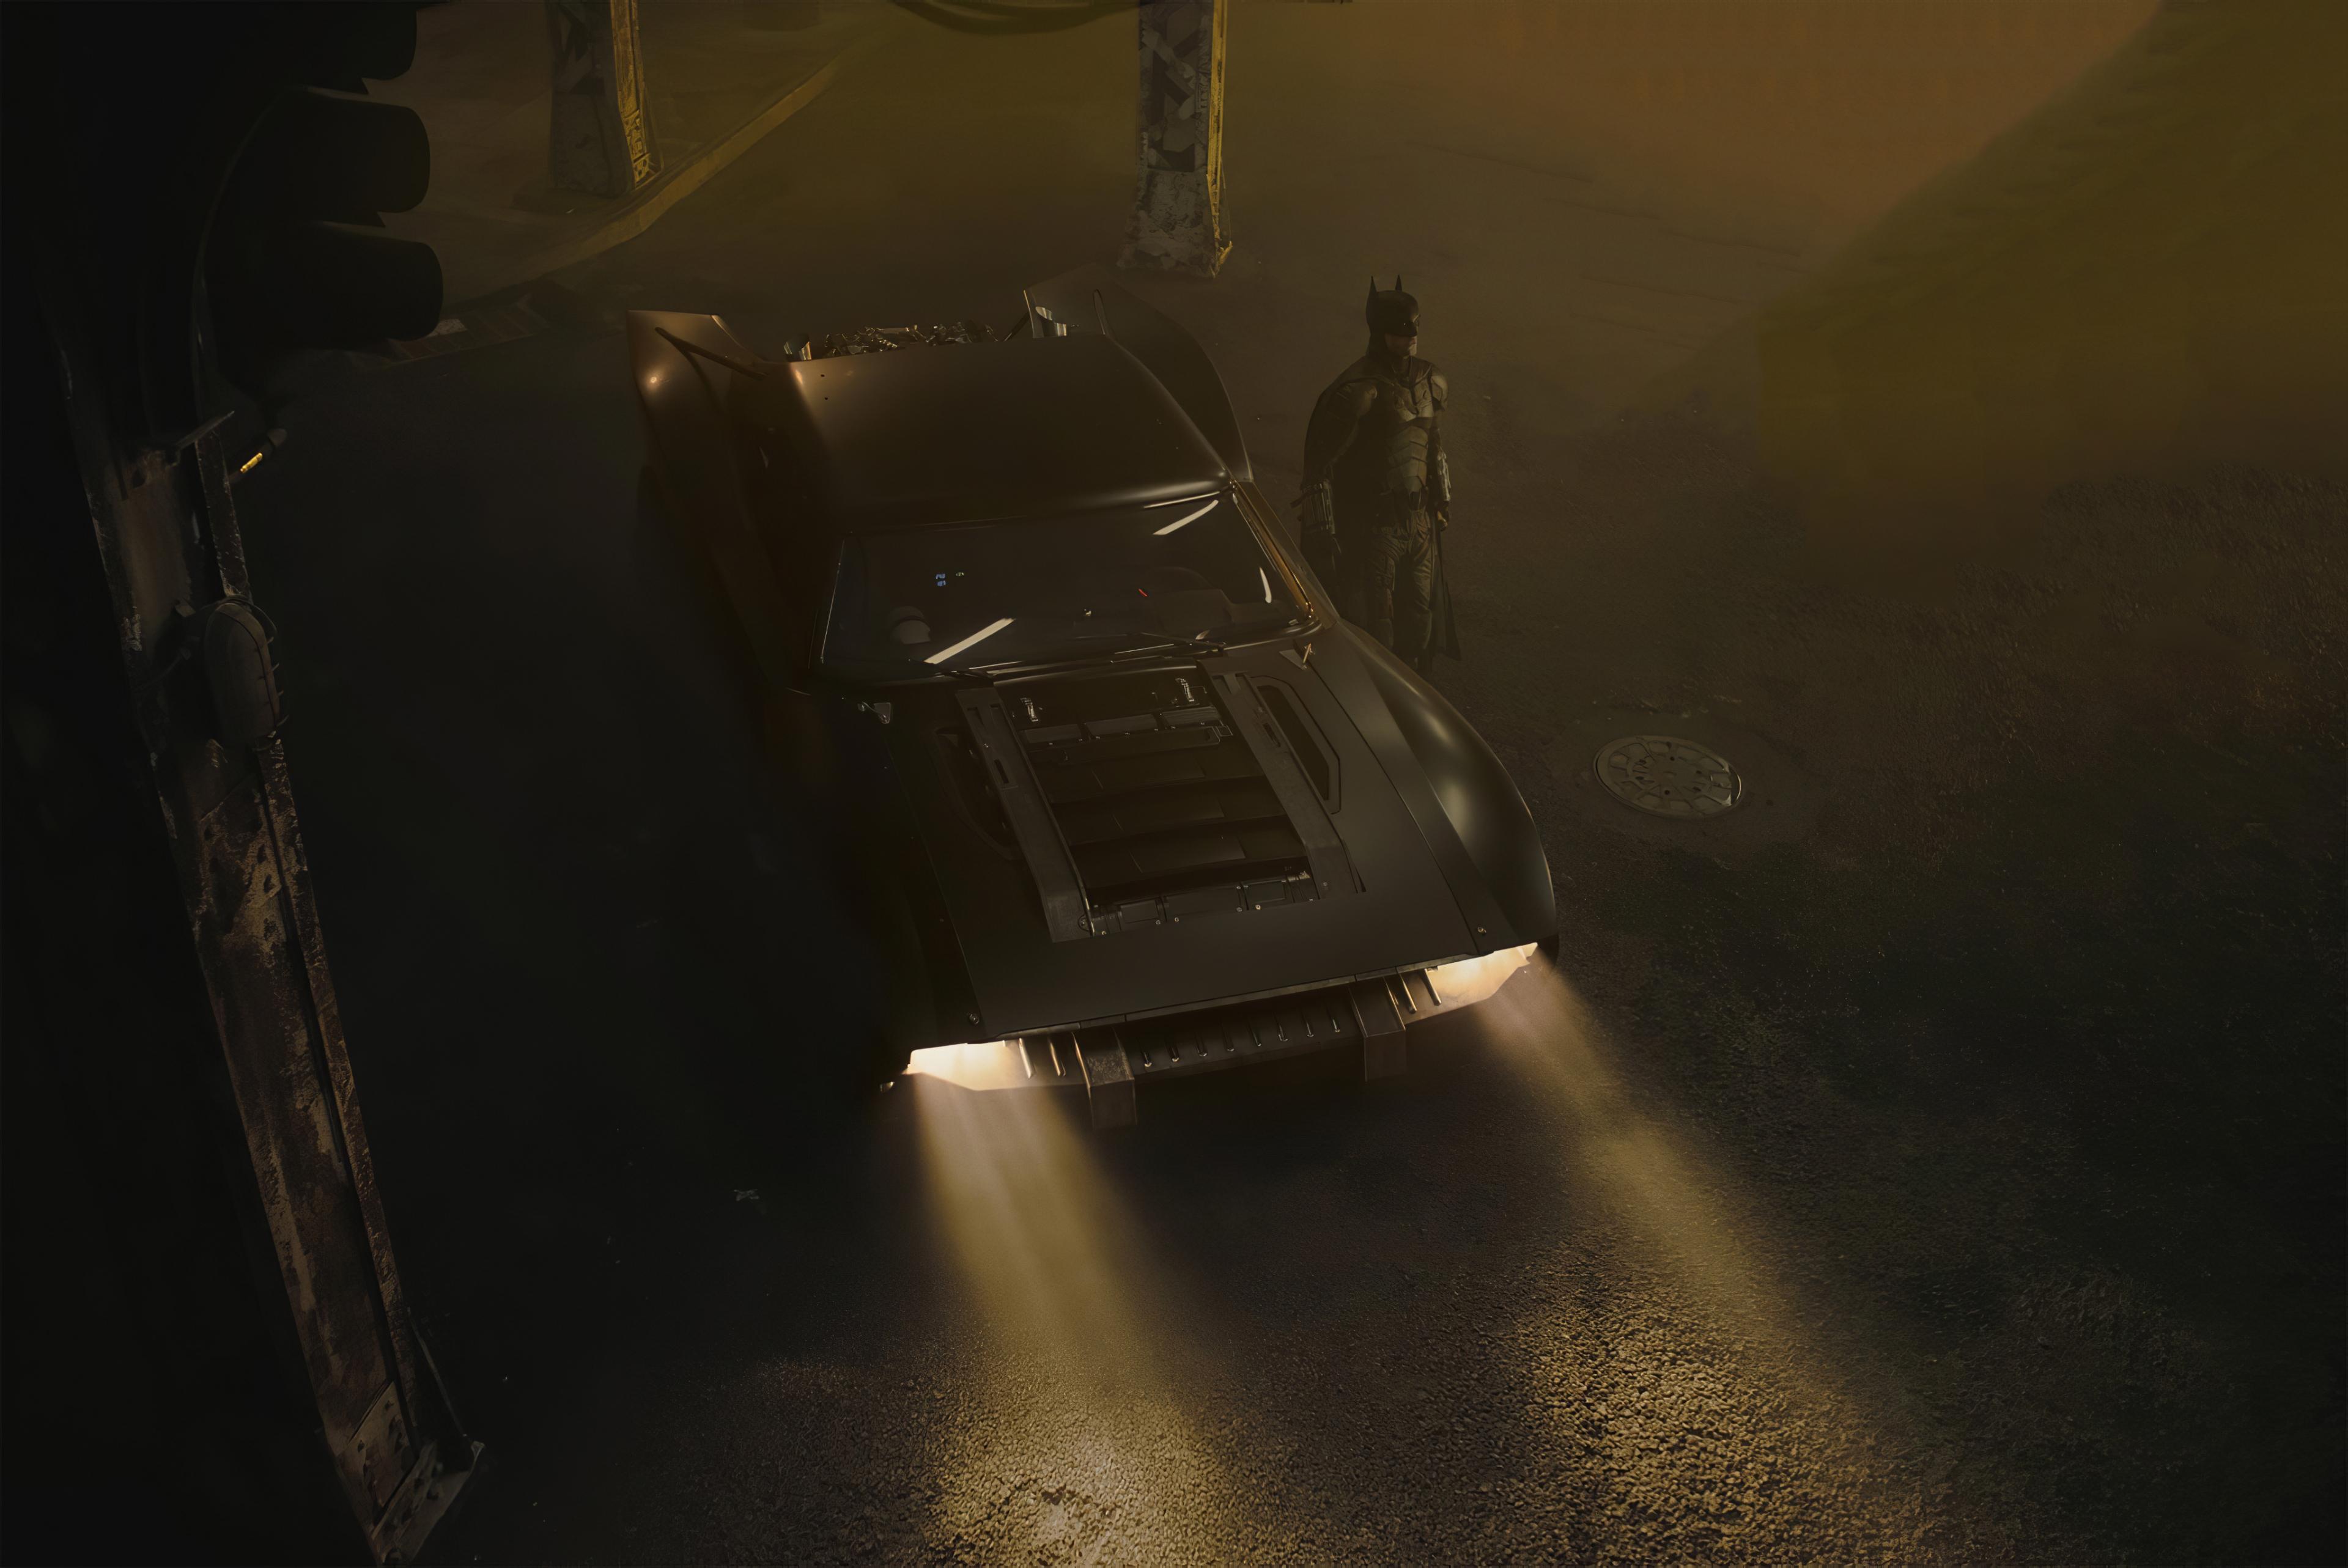 batman 2021 1589578461 - Batman 2021 - Batman 2021 wallpapers, Batman 2021 4k movie wallpapers